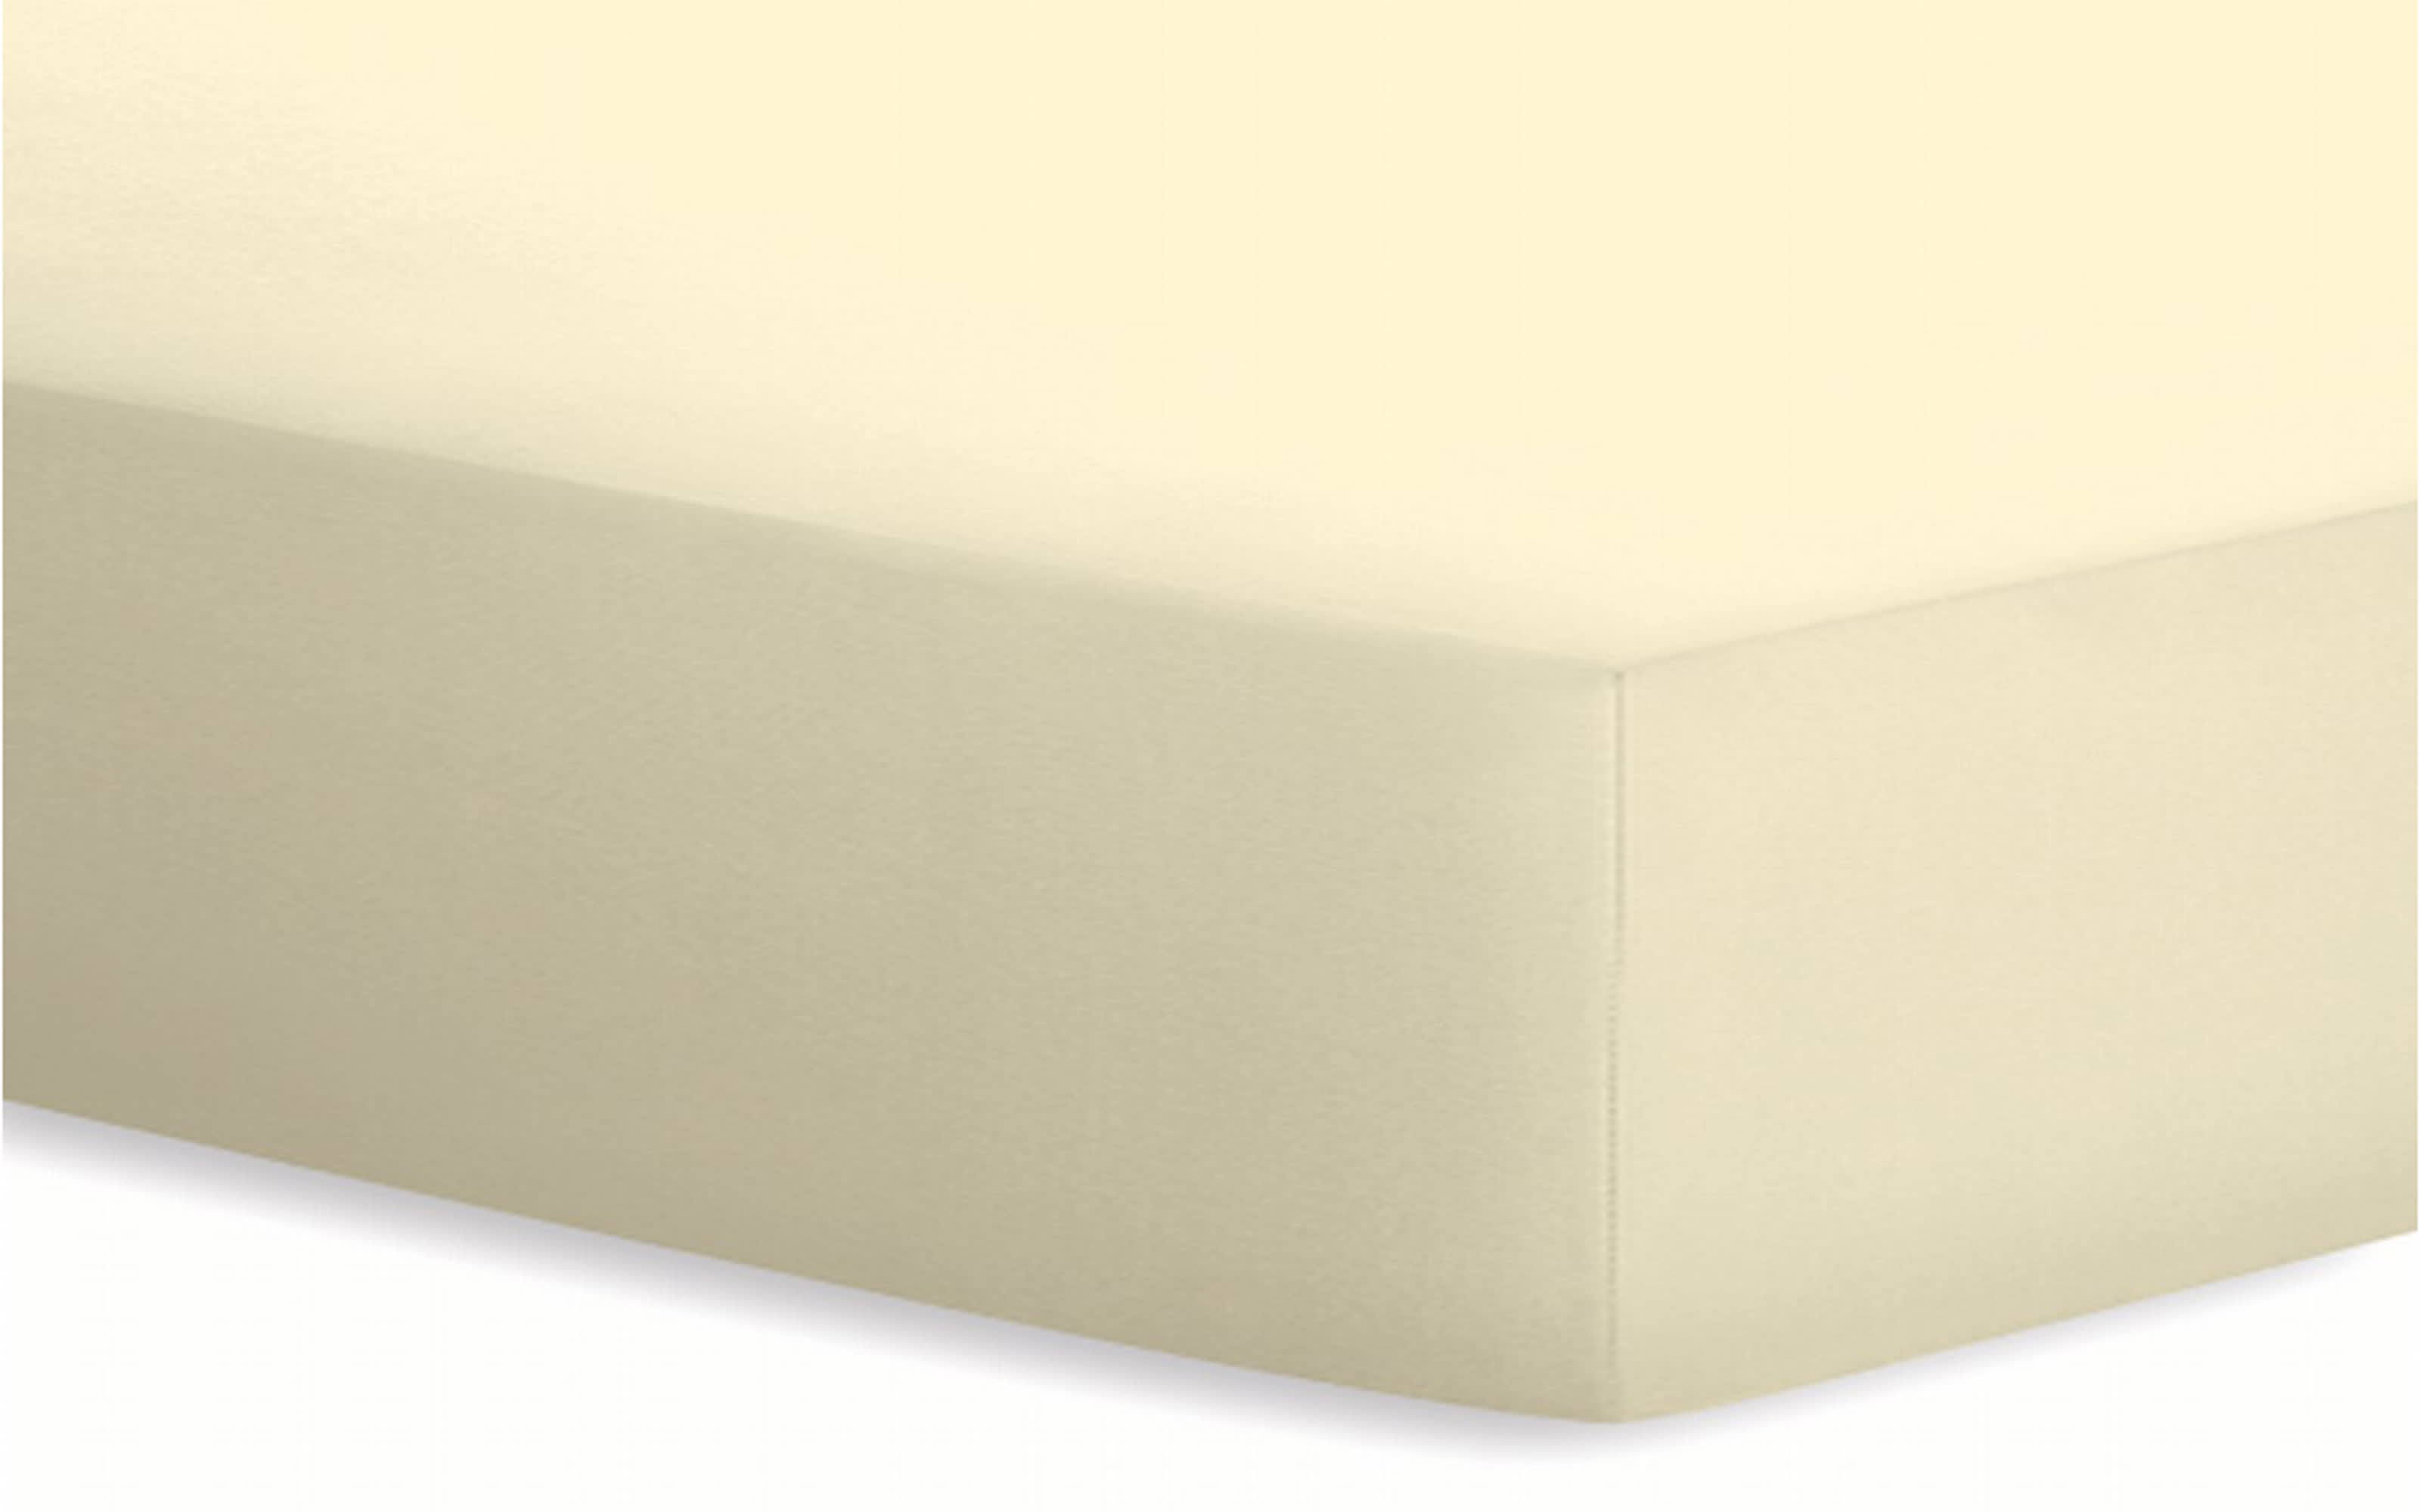 Spannbetttuch Basic in ecru, 140 x 200 x 25 cm